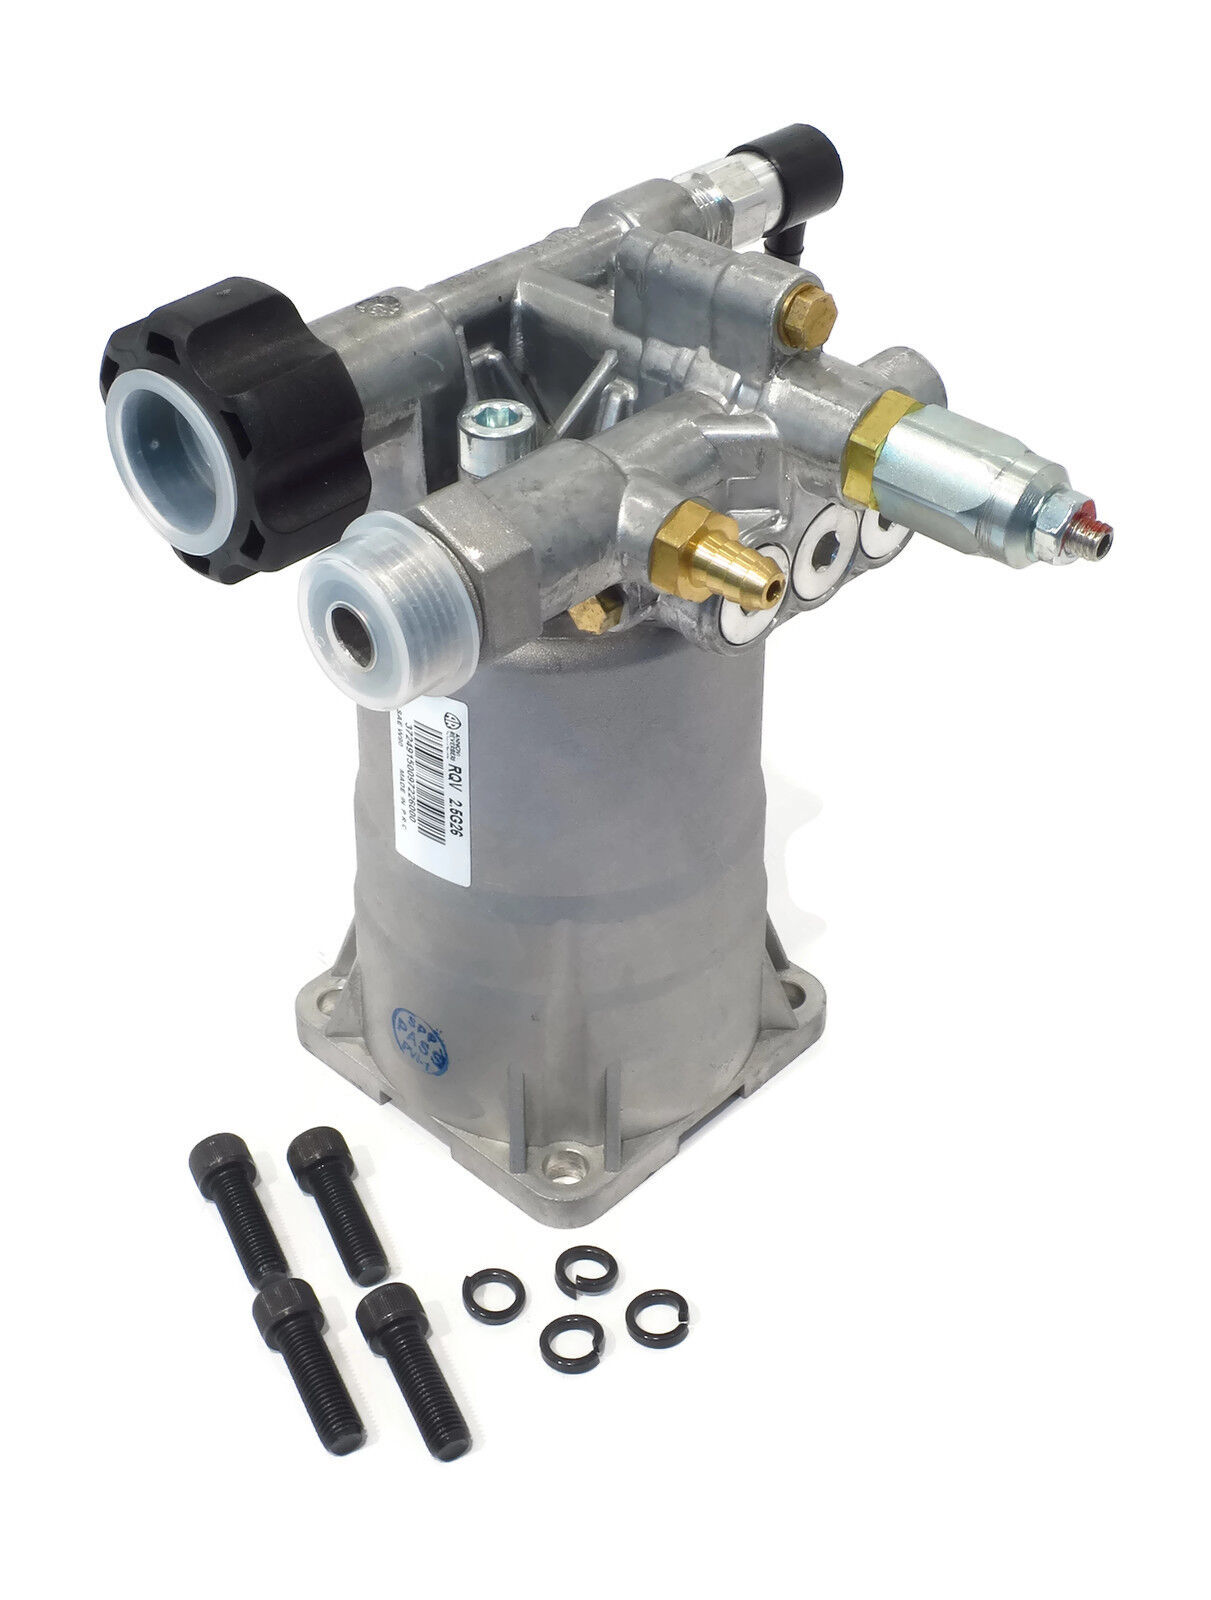 New 2700 PSI Pressure Washer Water Pump Fits John Deere HR-2410GH ...